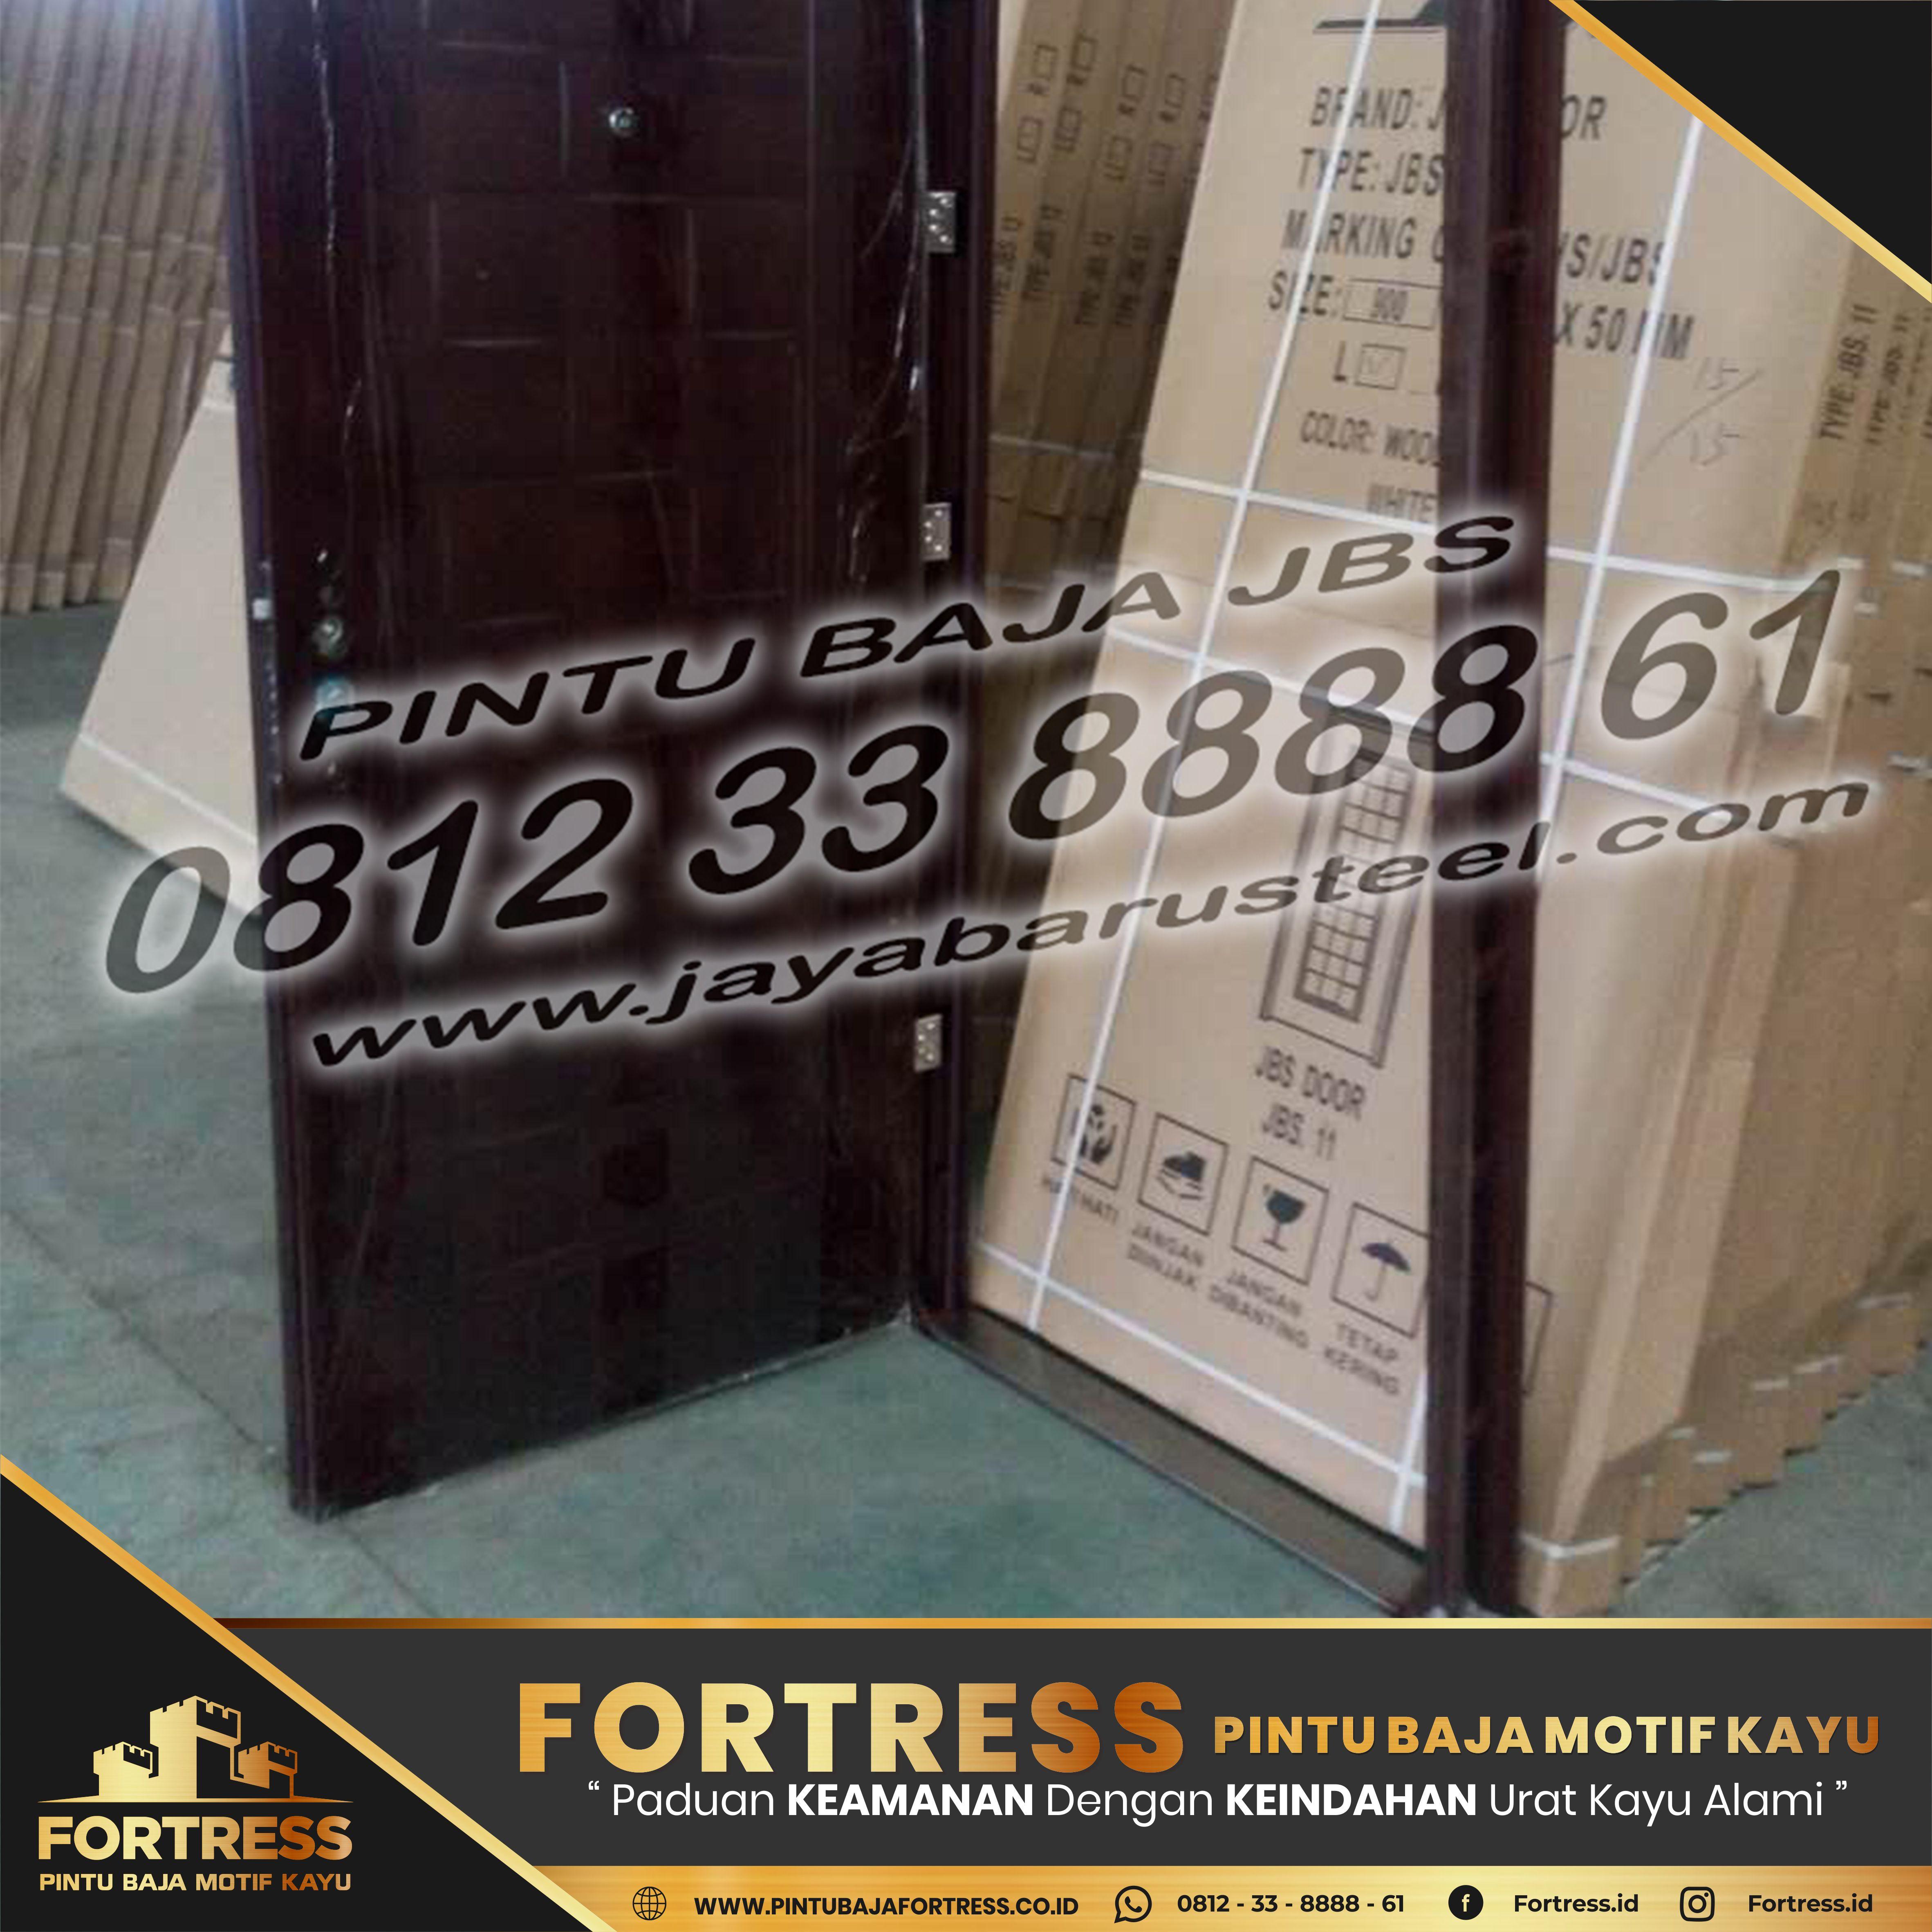 0812-91-6261-07 (FORTRESS) Banjar Masin Steel Valve Door, Ha …